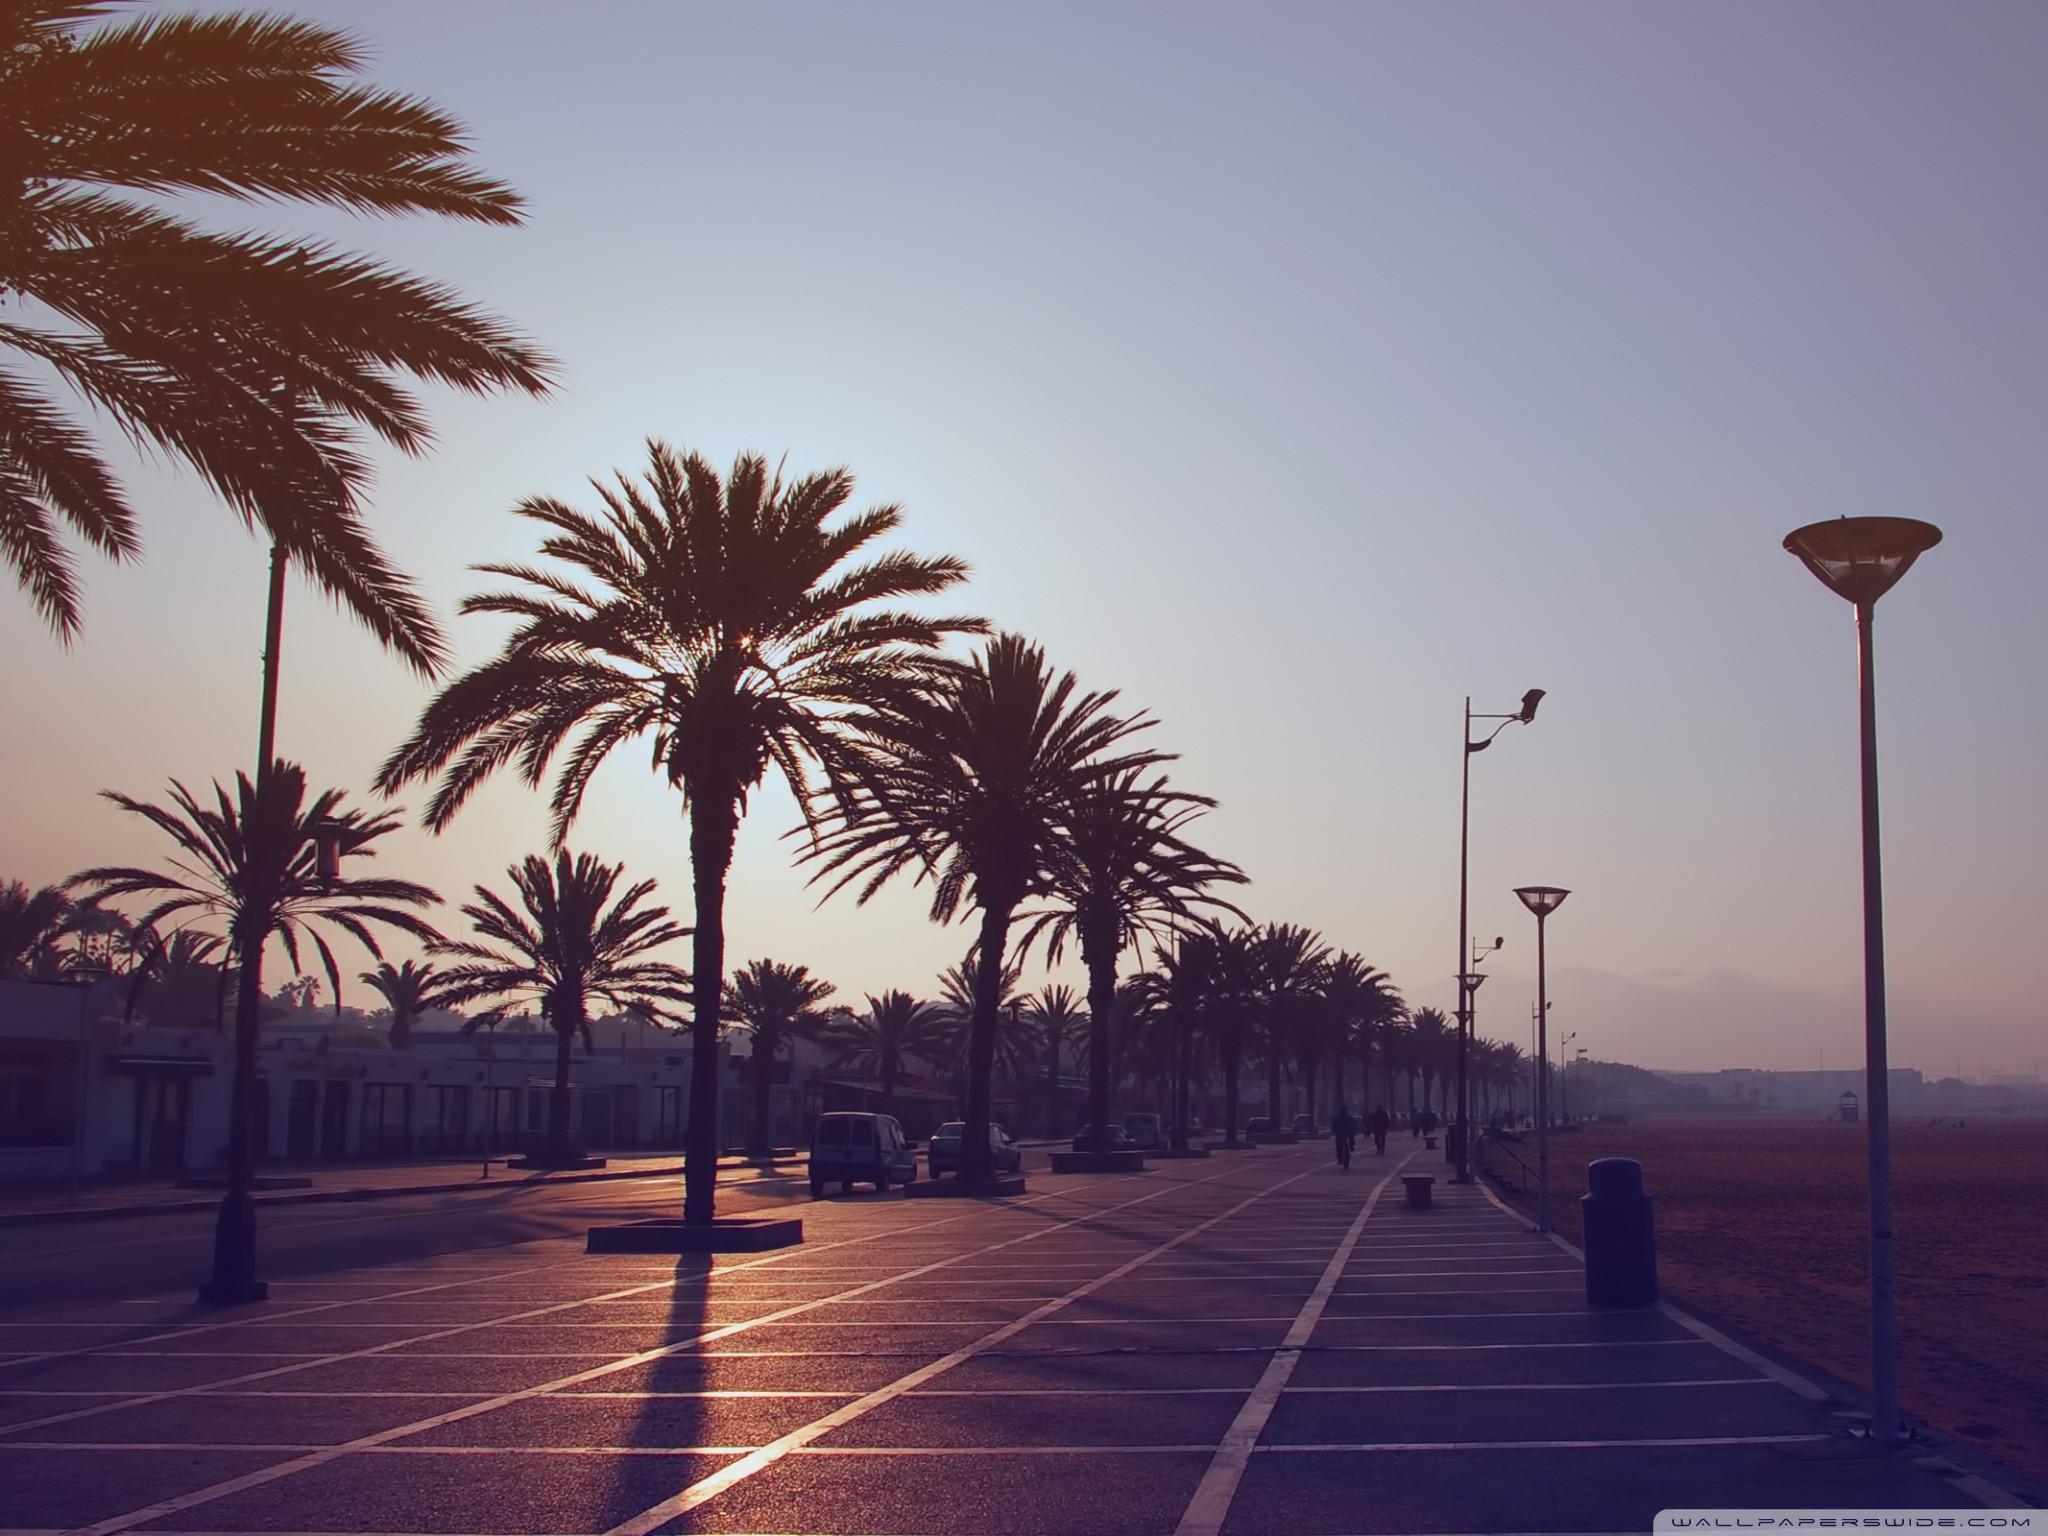 … vintage, seaside, photo, resort, city wallpaper, desktop hd